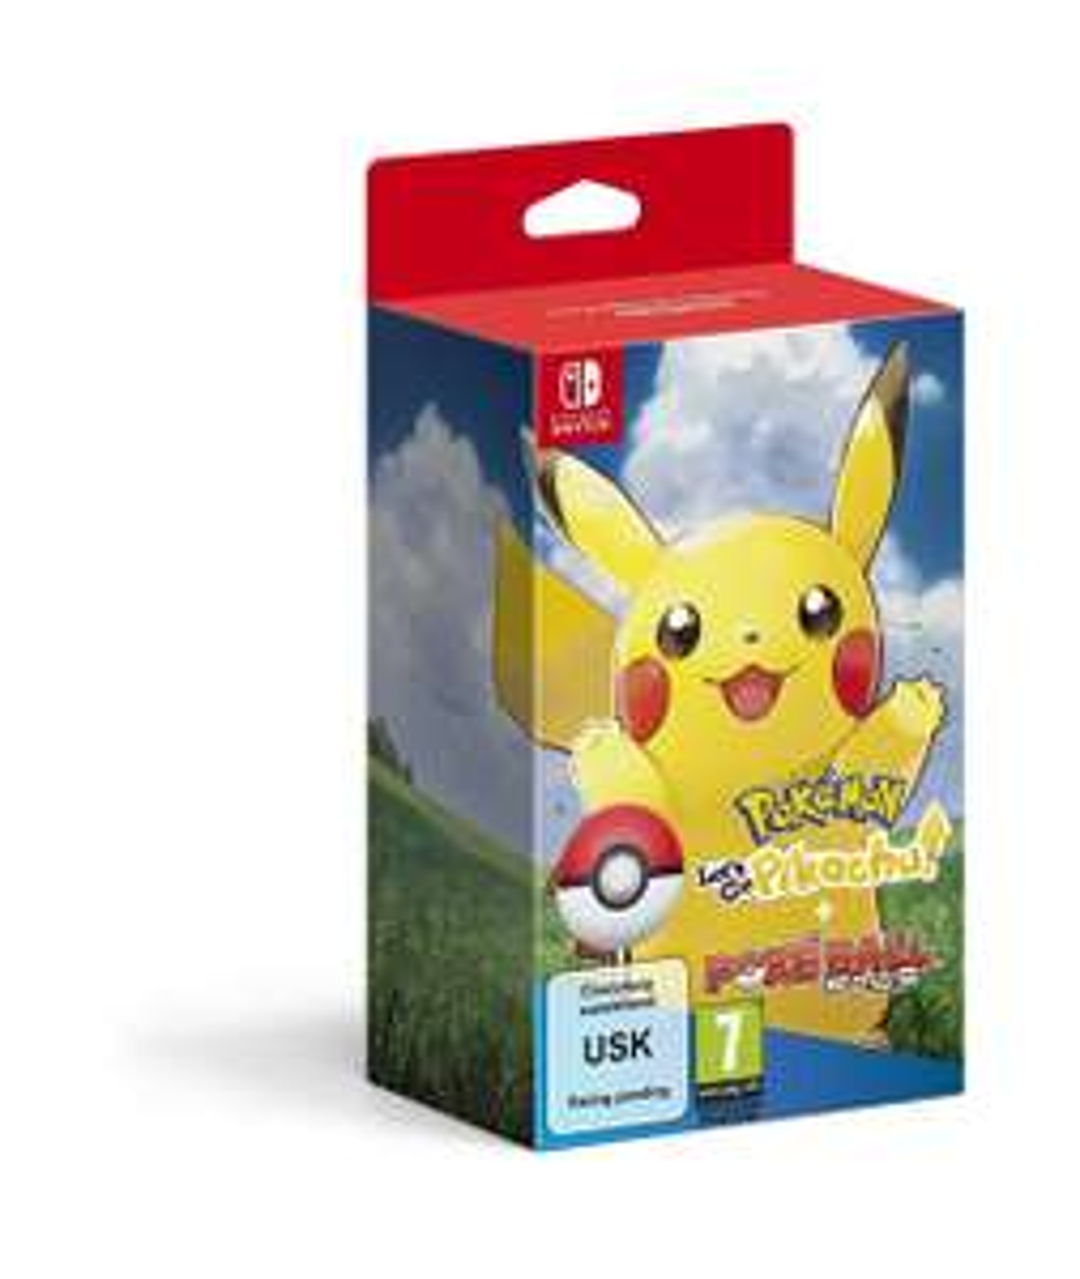 Pokemon Let's Go! Pikachu!/ Eevee! Plus Poke Ball Plus (Amazon) - £89.99 (£87.99 for Prime members)